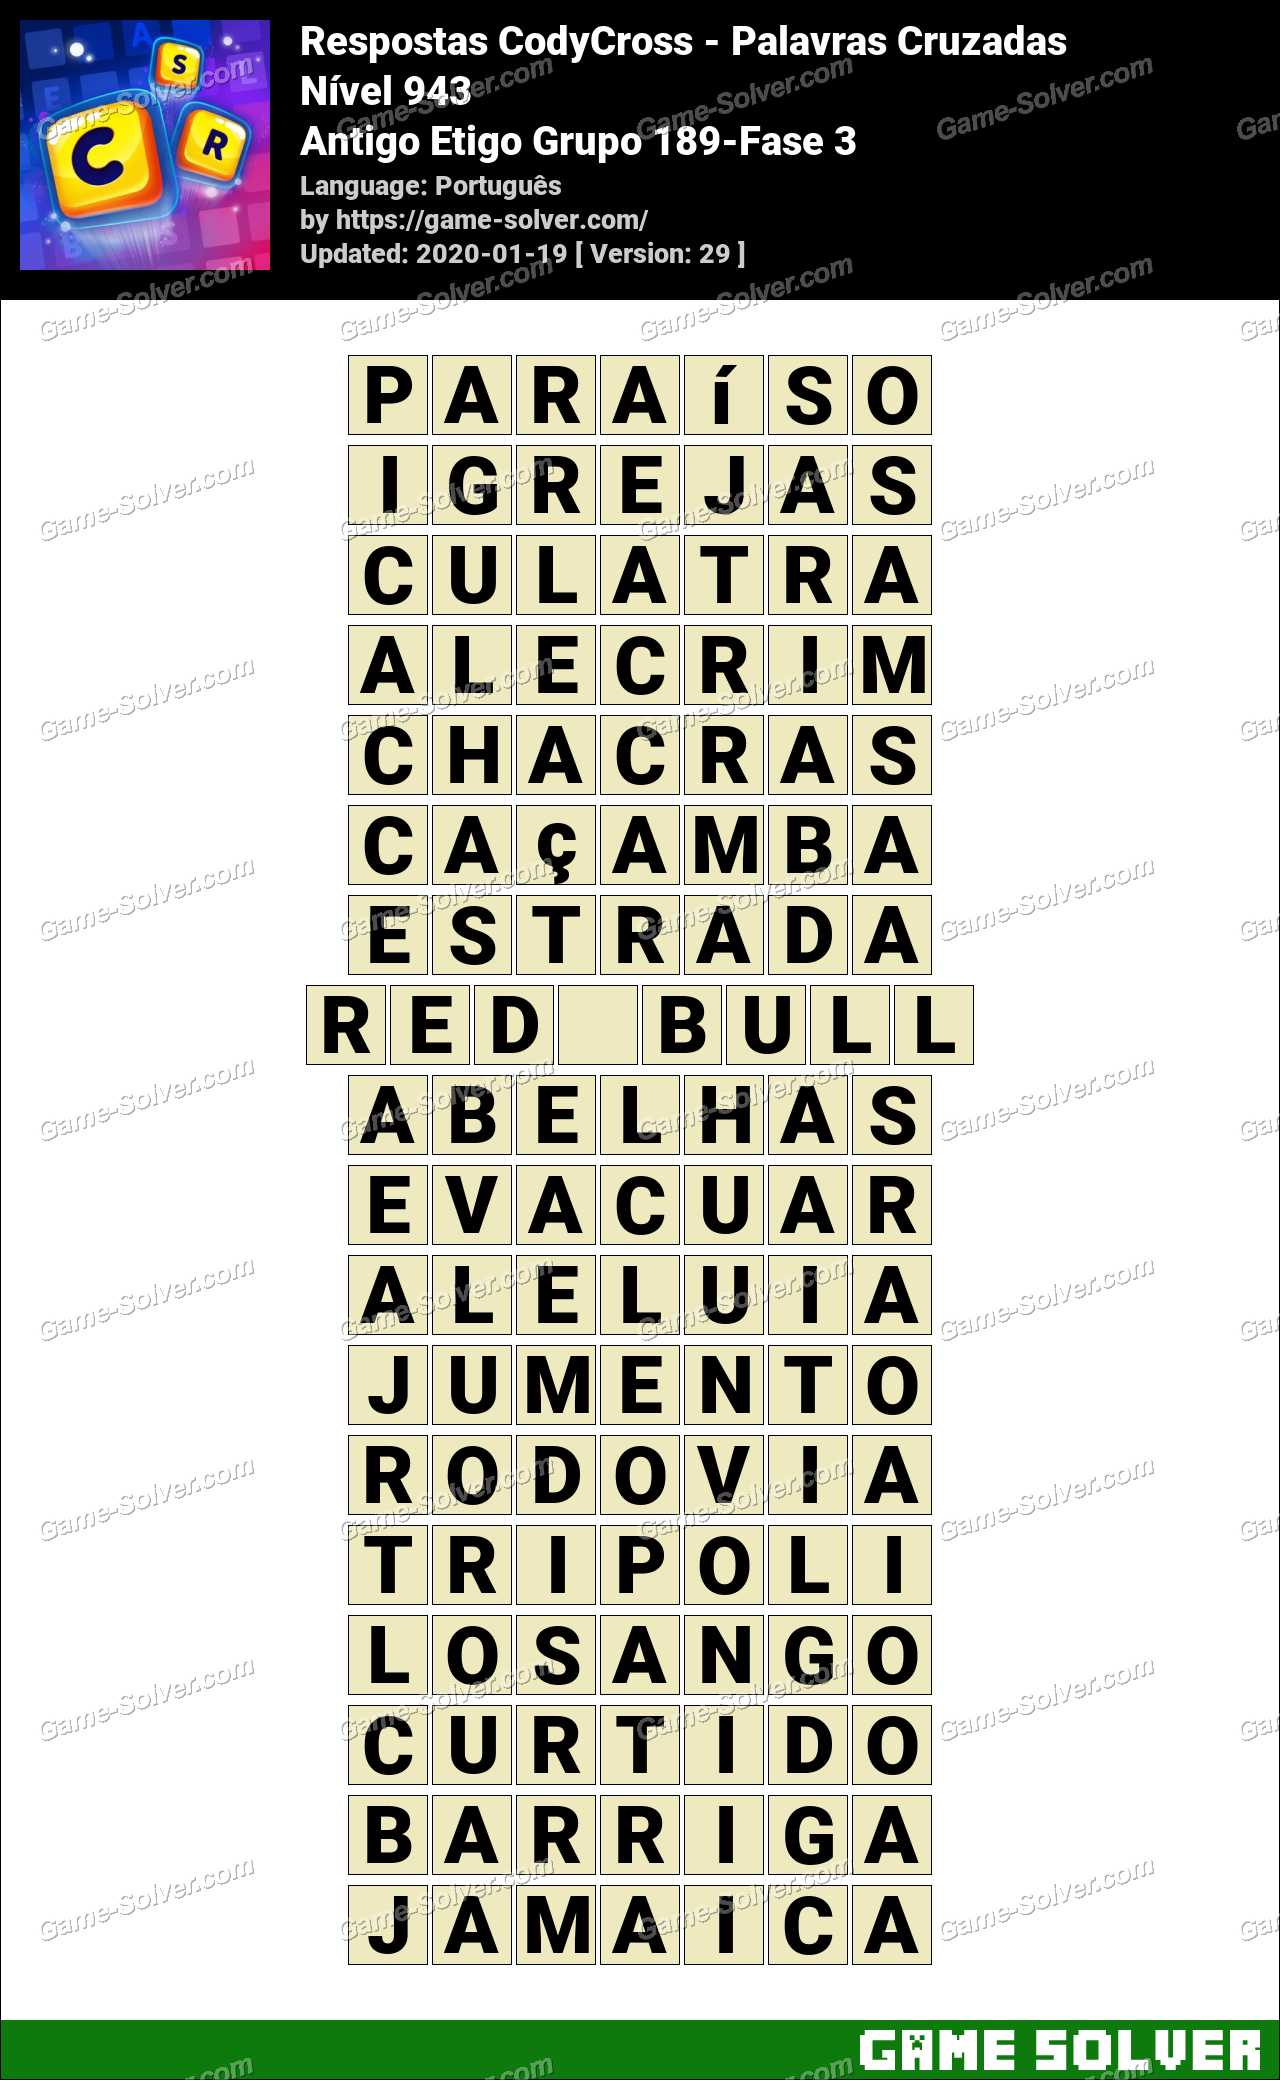 Respostas CodyCross Antigo Etigo Grupo 189-Fase 3